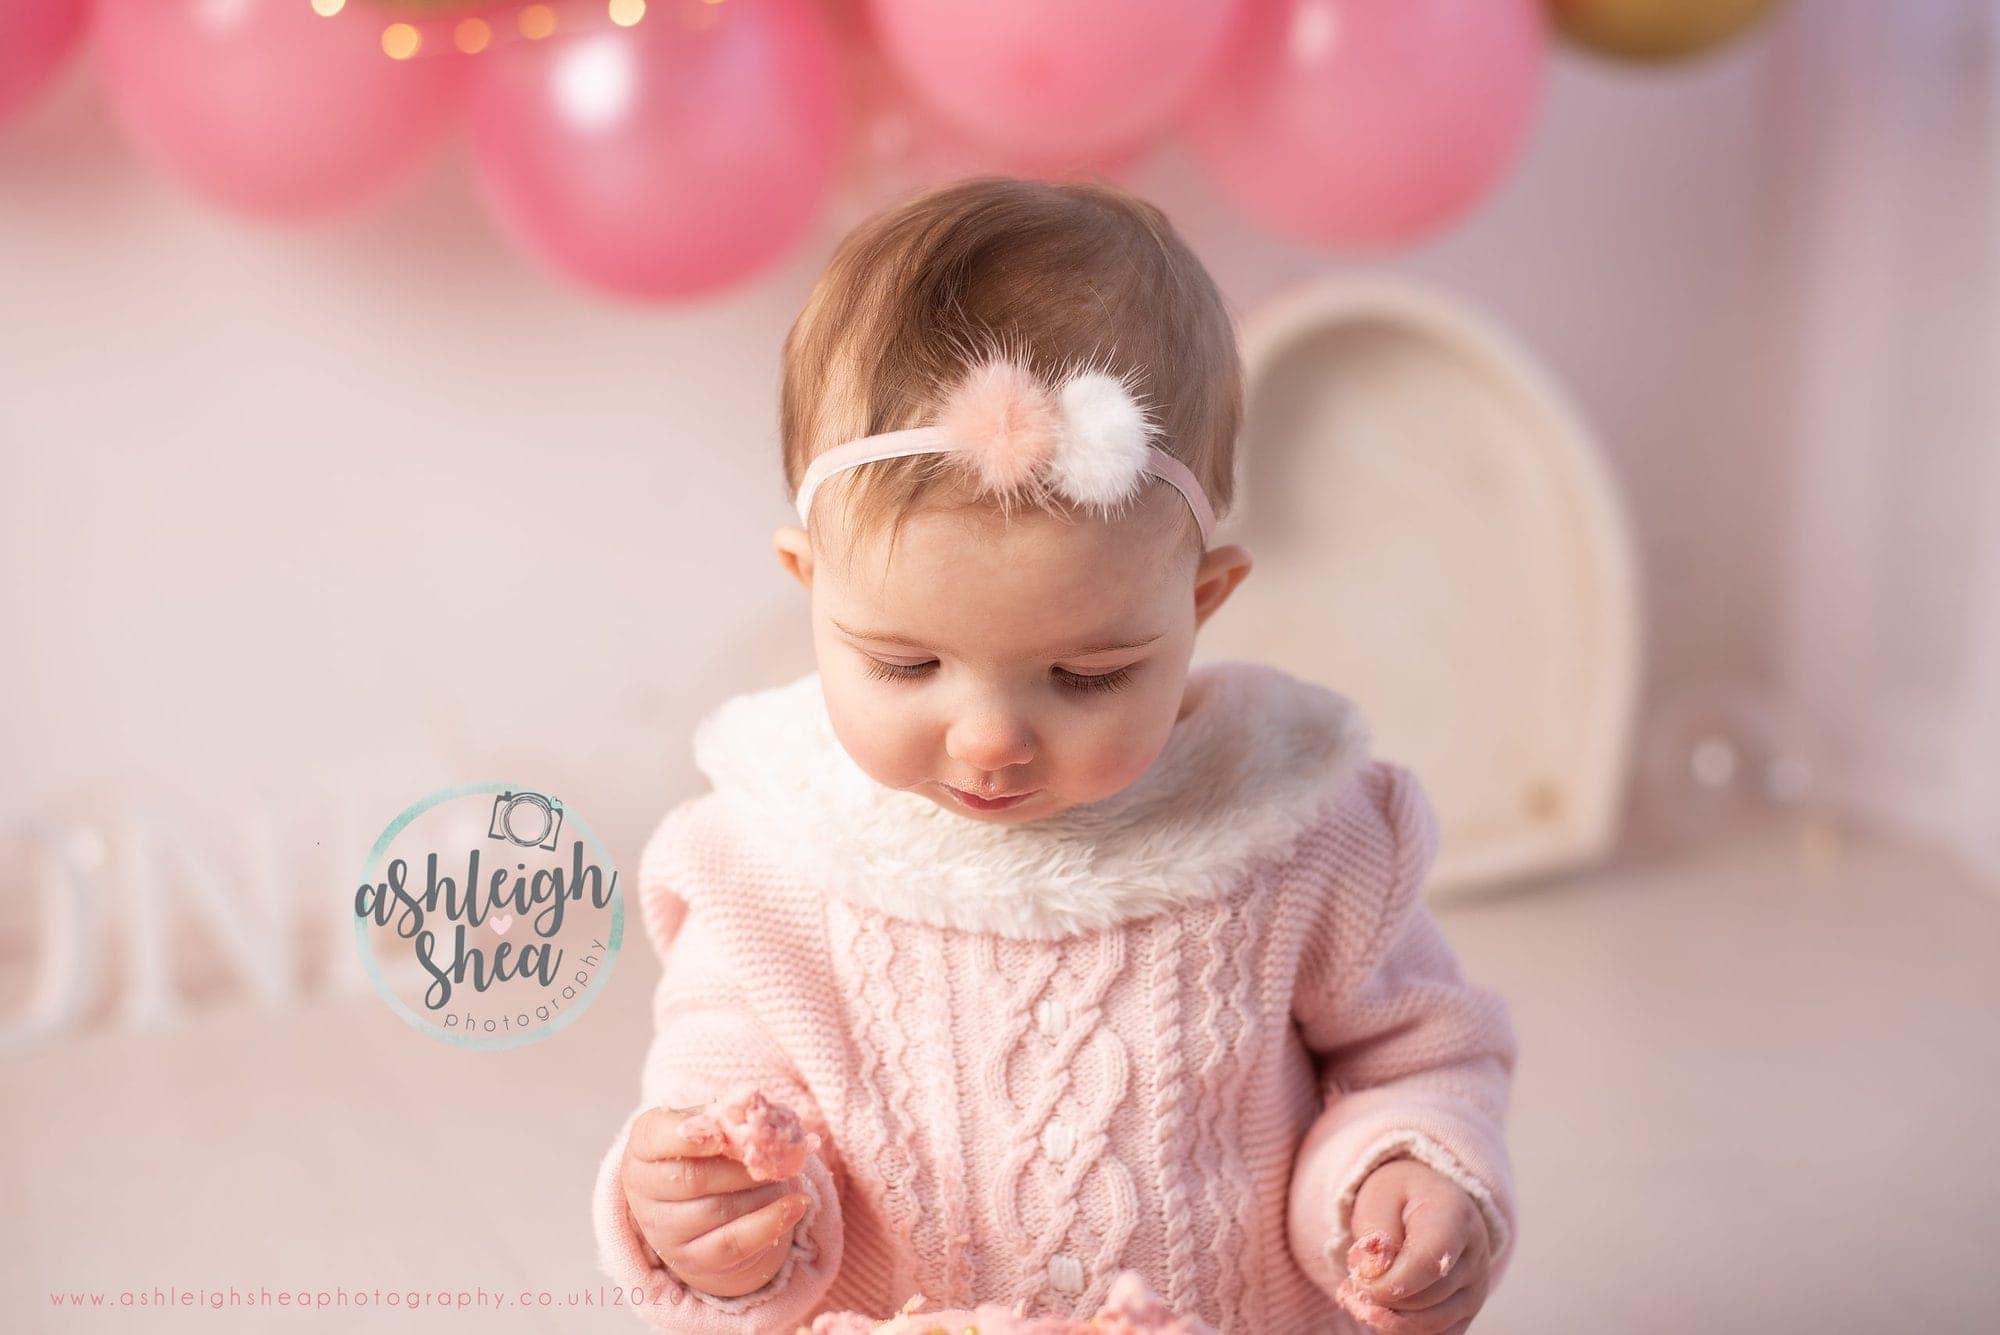 Close Up, Pretty Girl, Balloon Garland, Ashleigh Shea Photography, Cake Smash Near Me